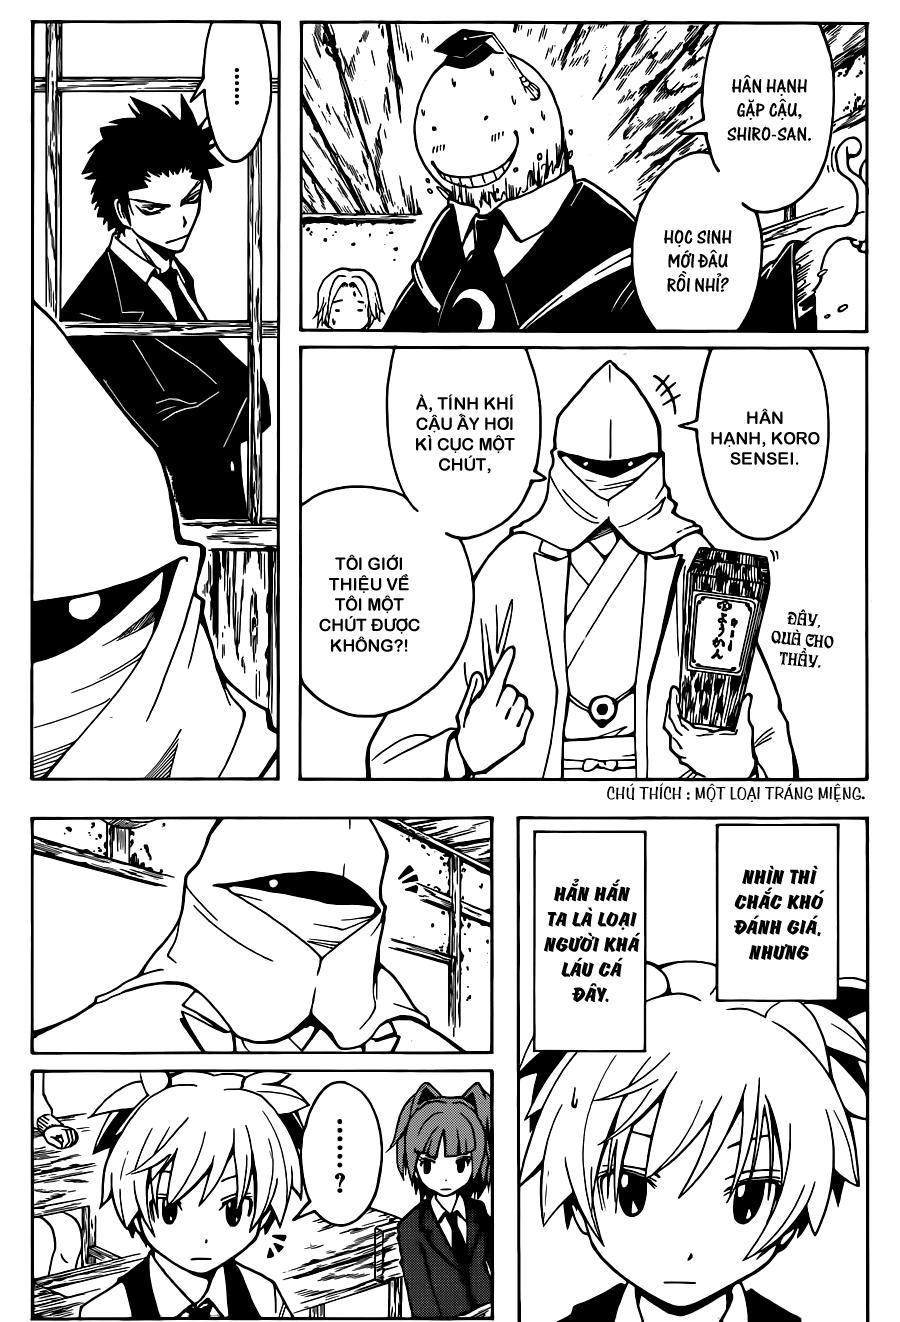 Ansatsu Kyoushitsu chap 29 trang 11